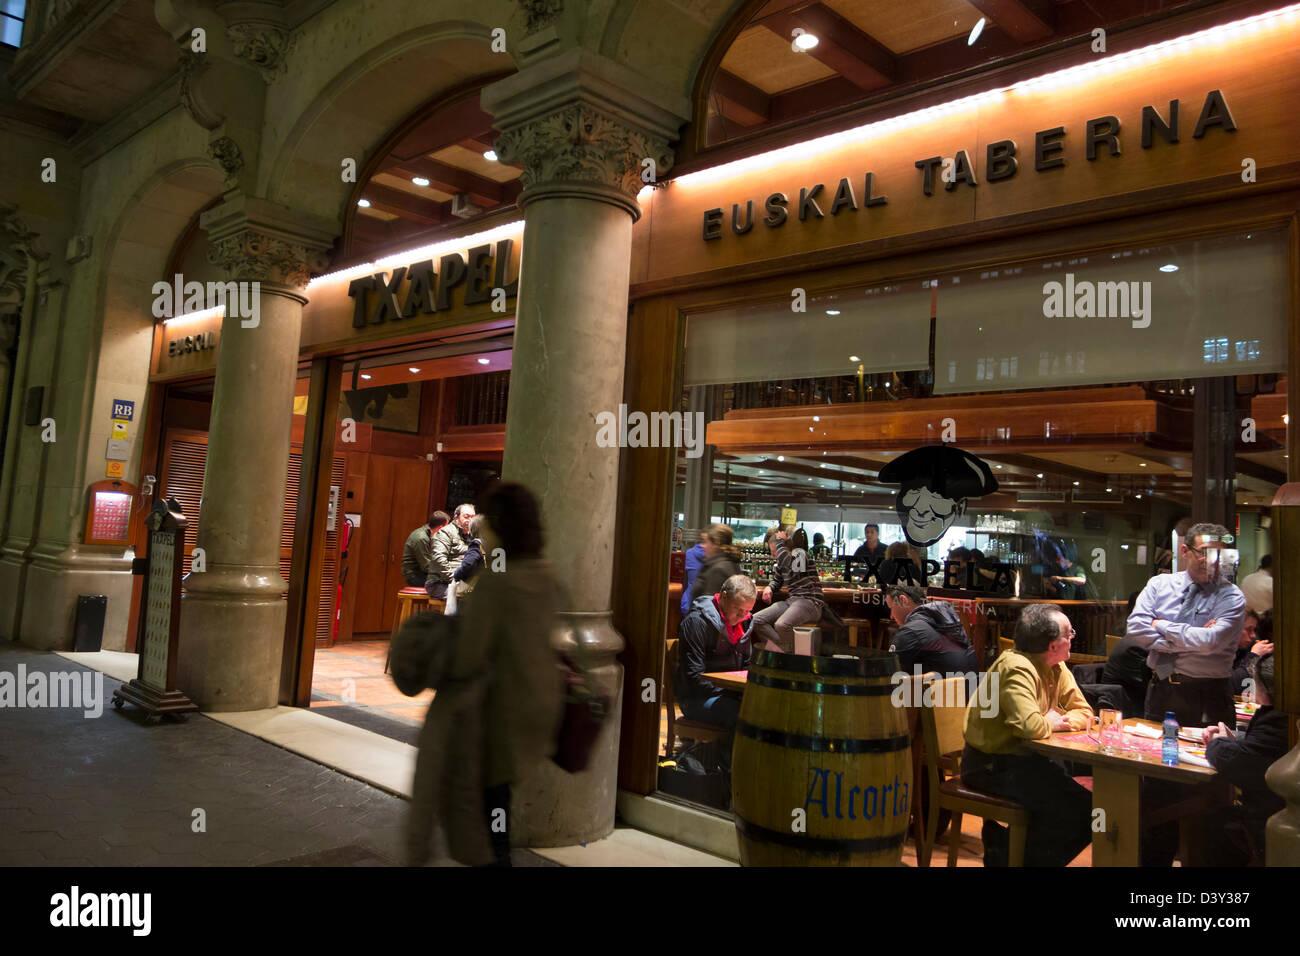 Txapel taberna, Barcelona, Spain, Europe - Stock Image